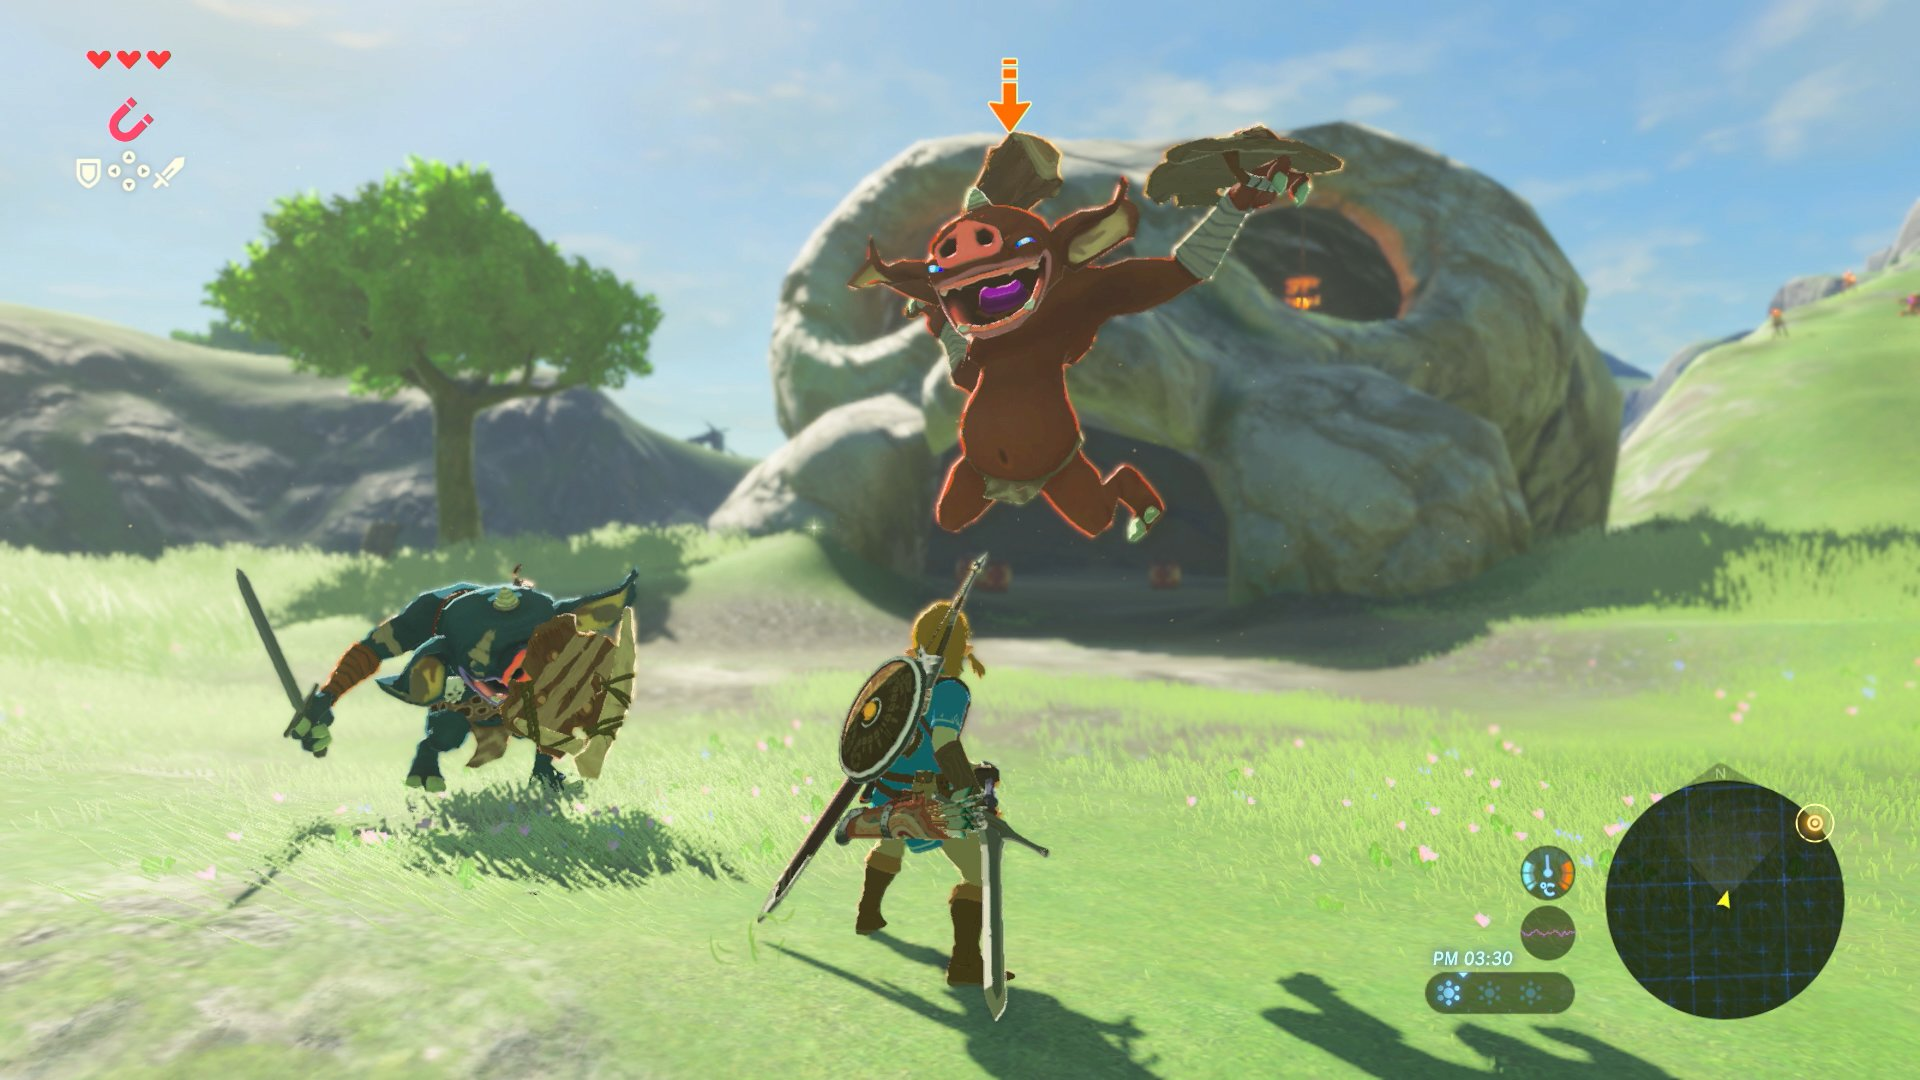 Nové screenshoty z The Legend of Zelda: Breath of the Wild 139295